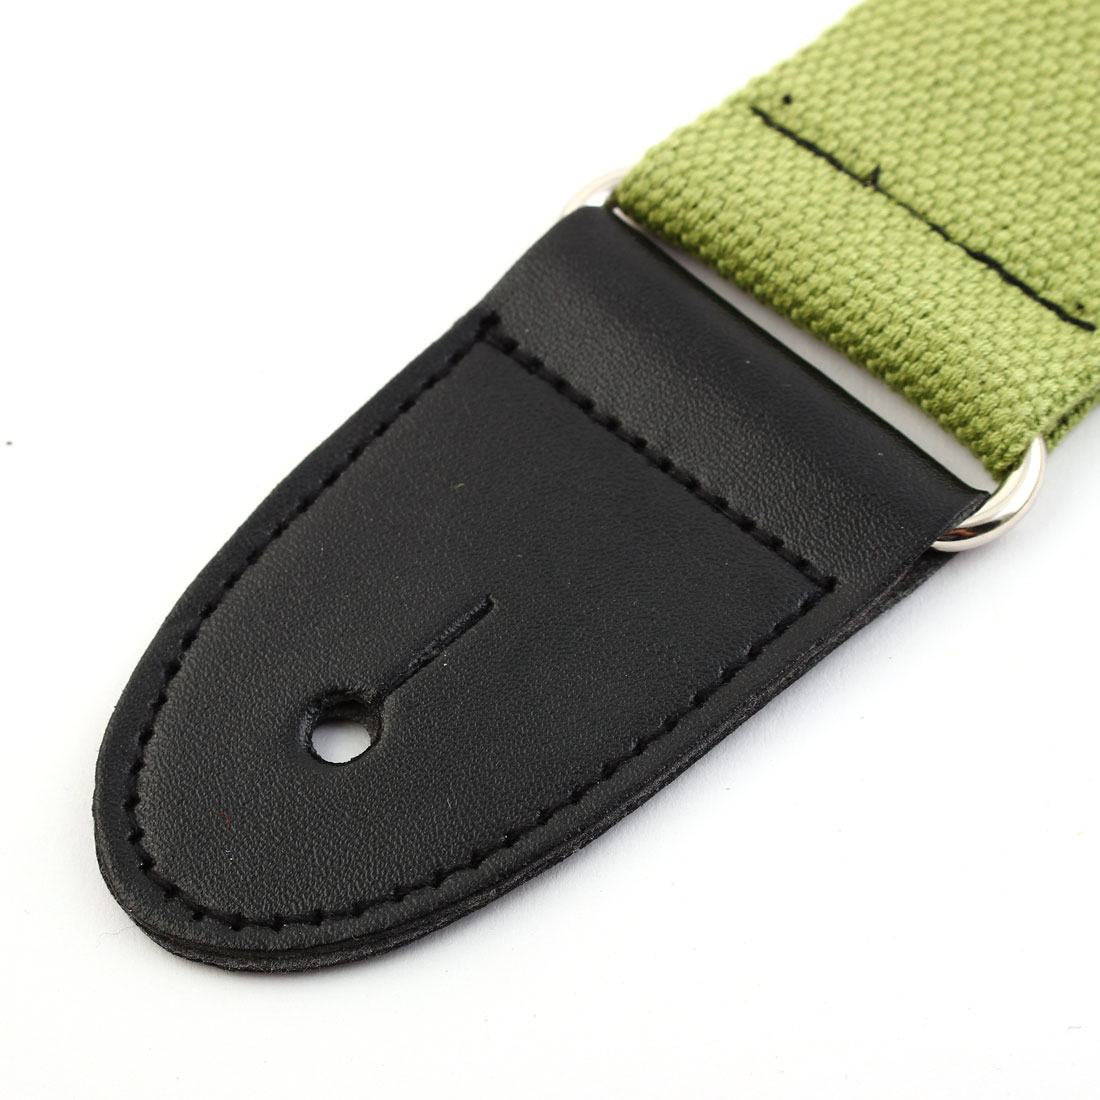 Nylon Bass Belt Adjustable Electric Guitar Strap 80-140cm Length Green - image 1 de 6